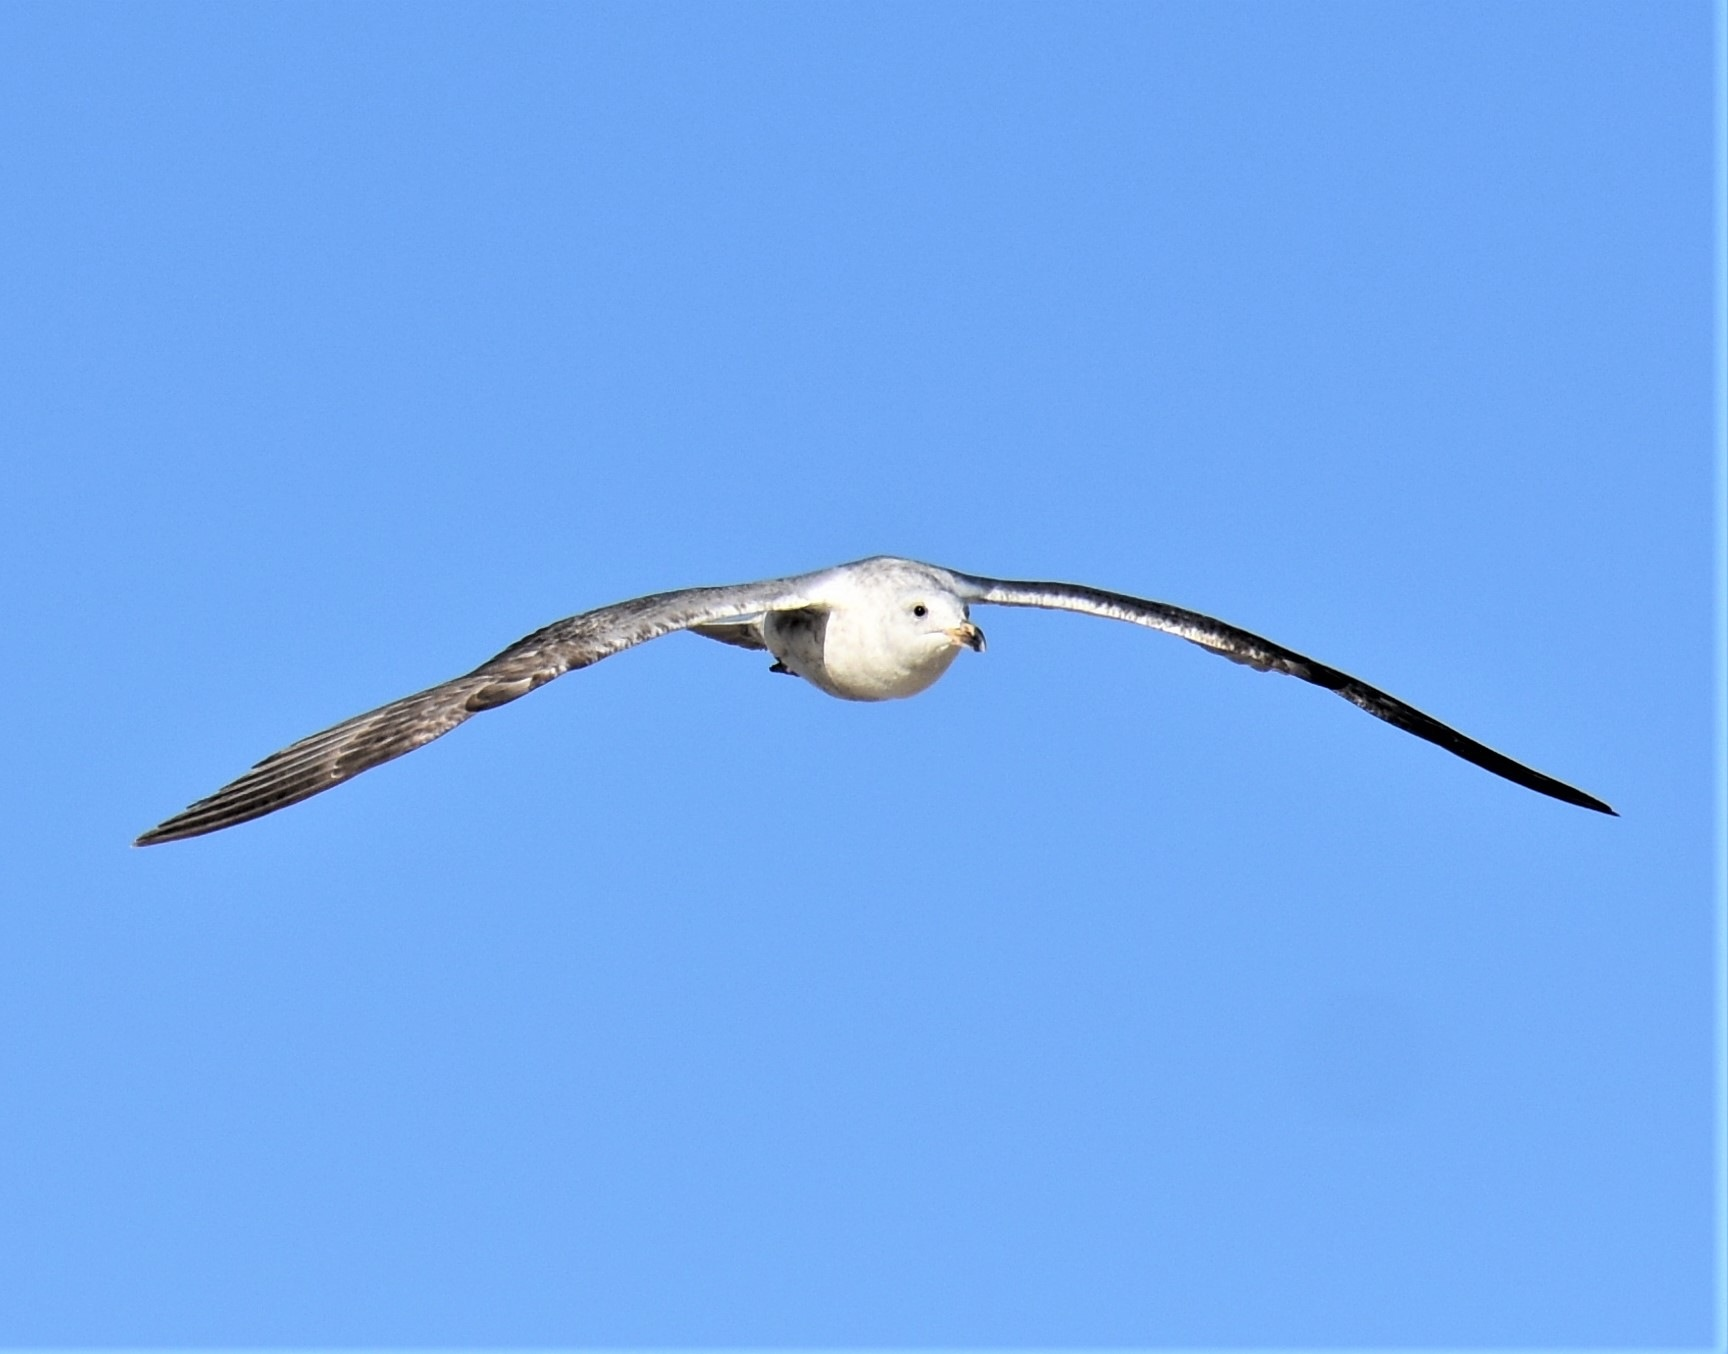 In flight by deanna.polk